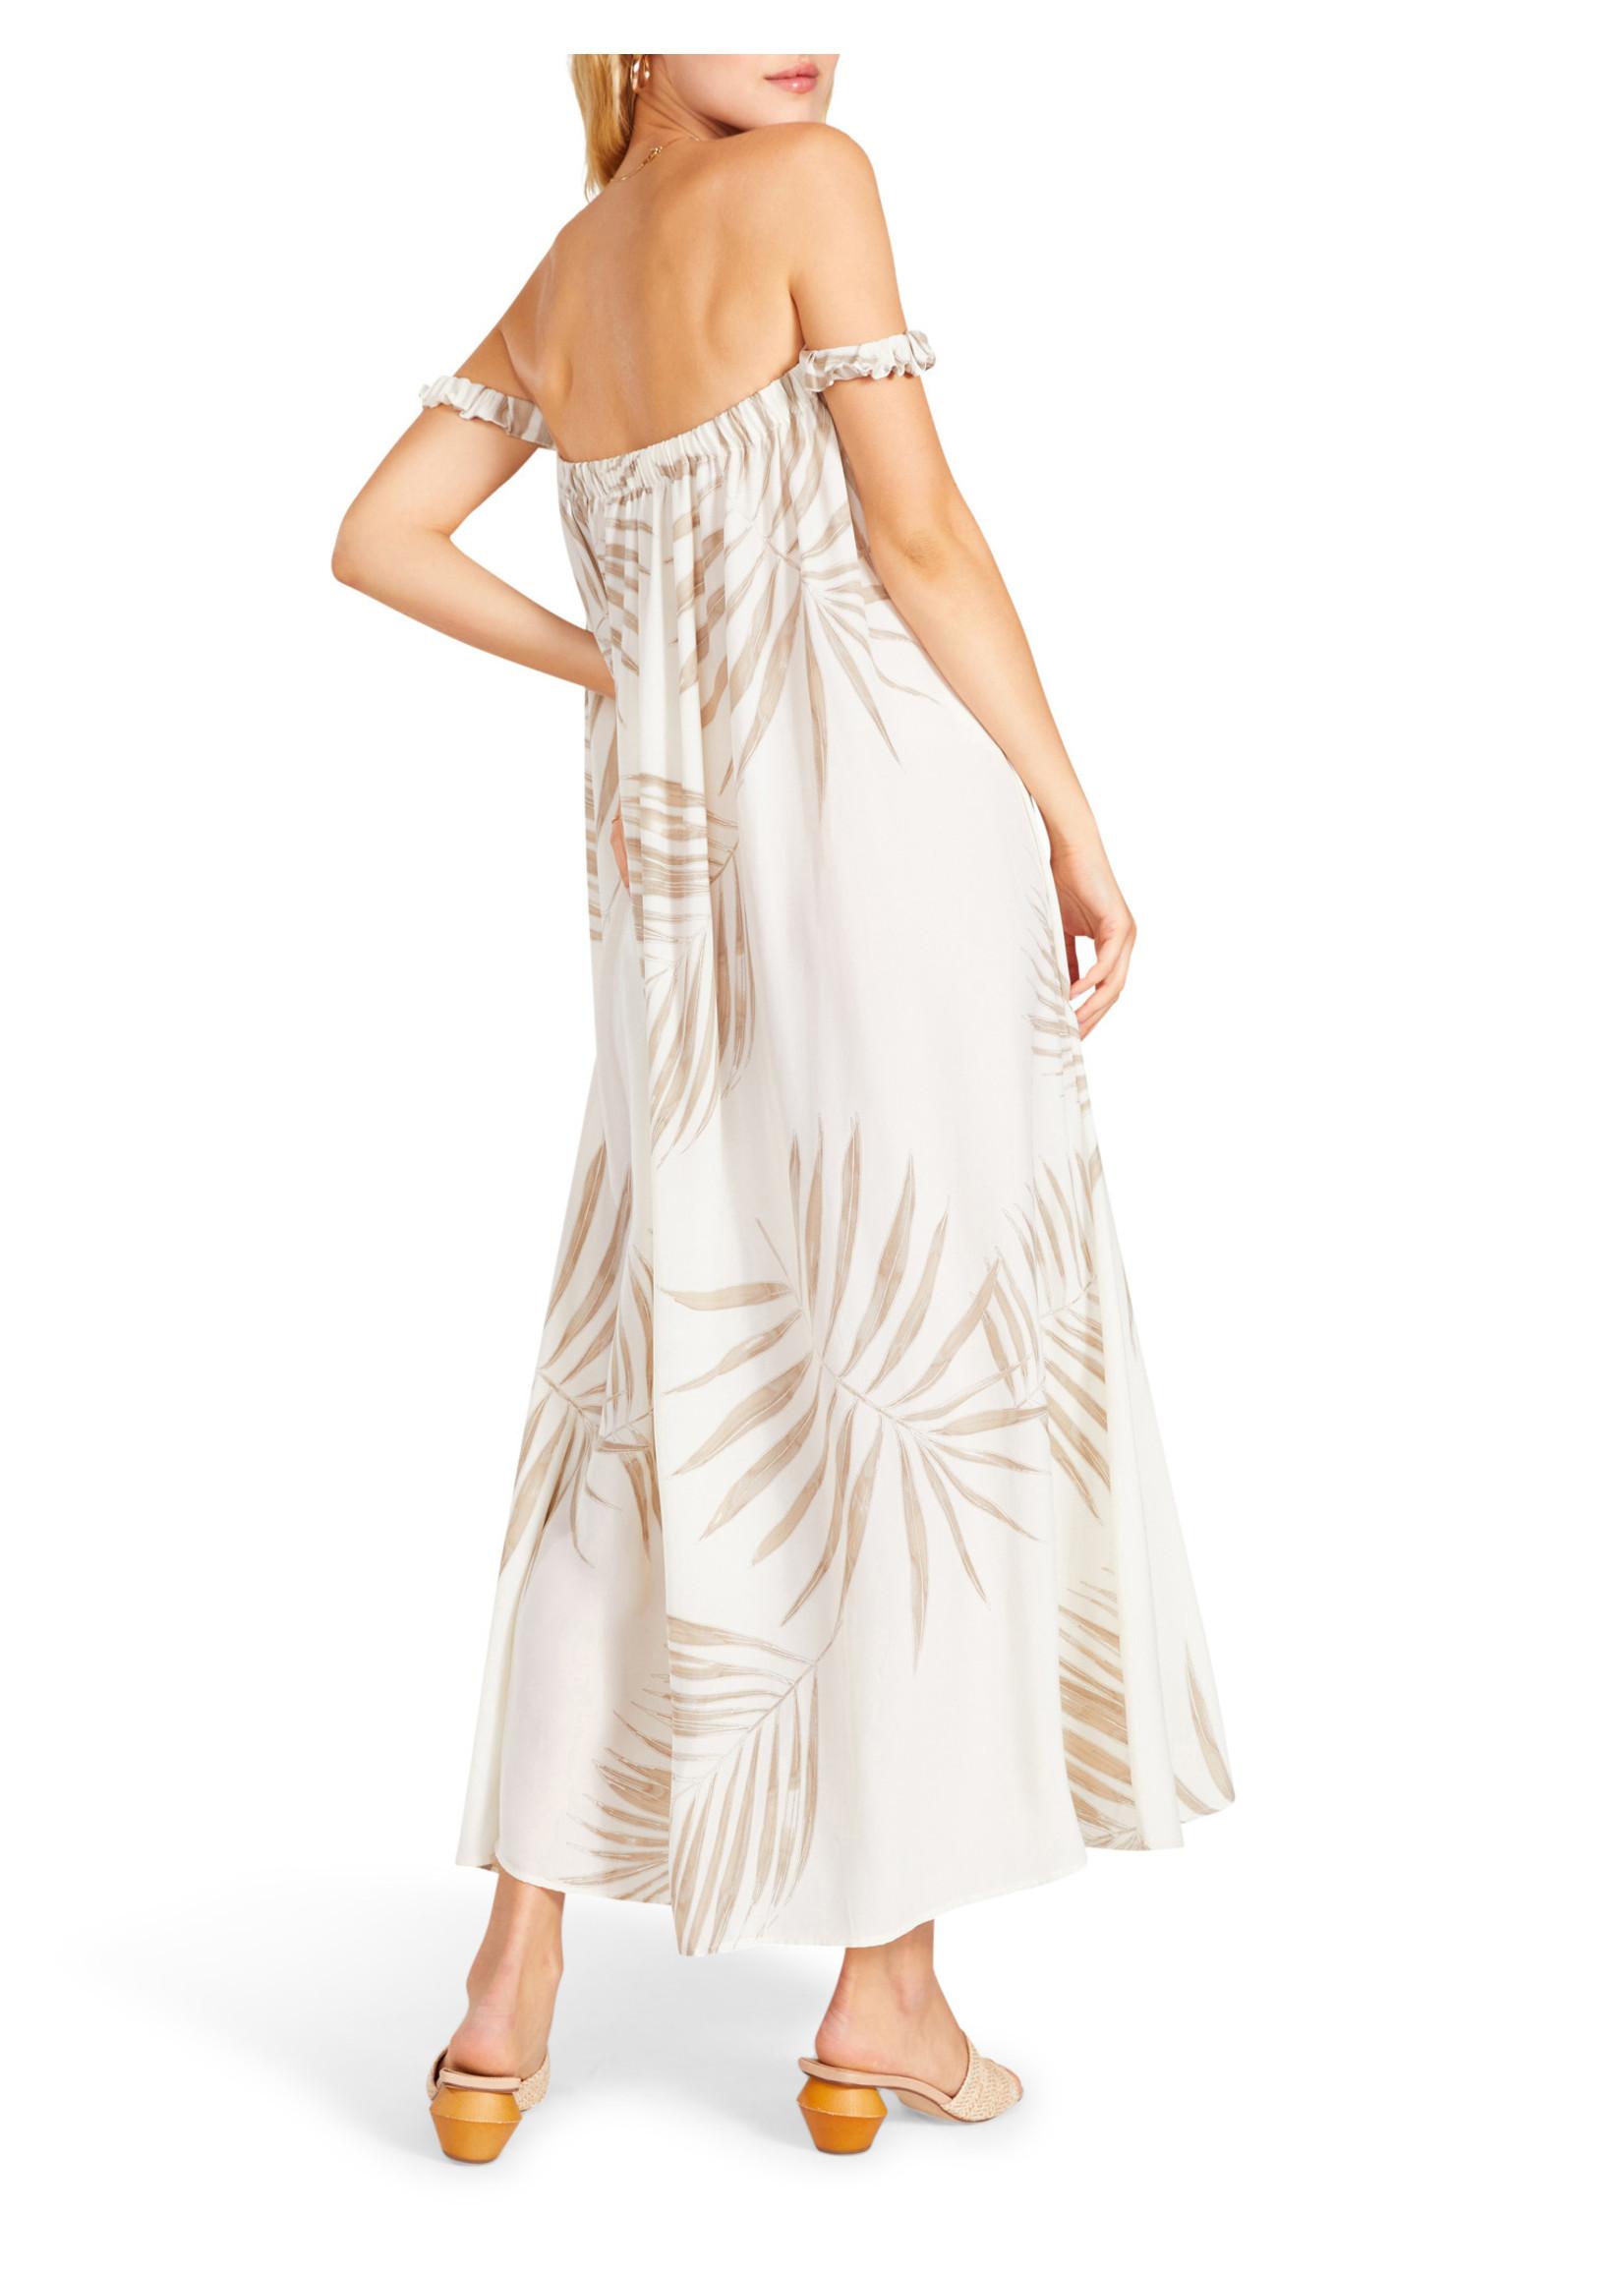 BB Dakota Palm Down Off The Shoulder Dress - BL208137